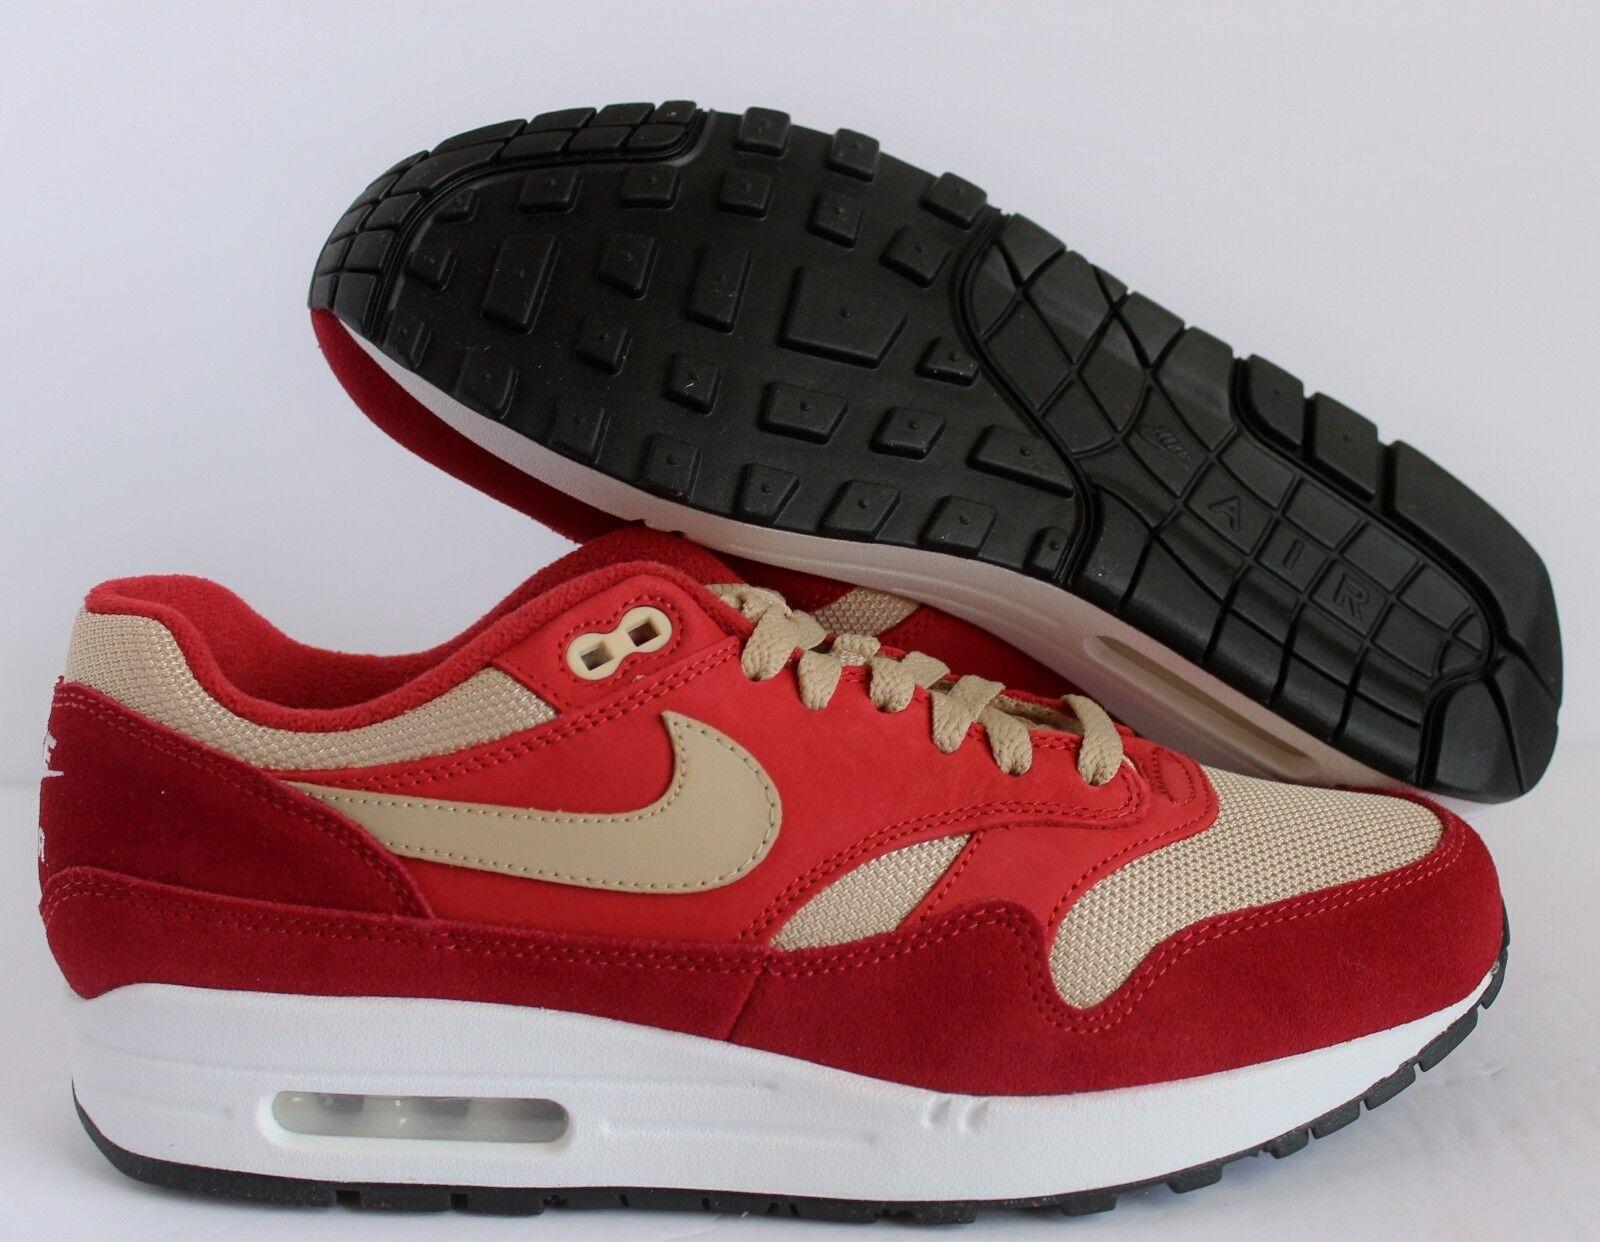 Nike Nike Nike air max 1 premium - retro 0f6a5b